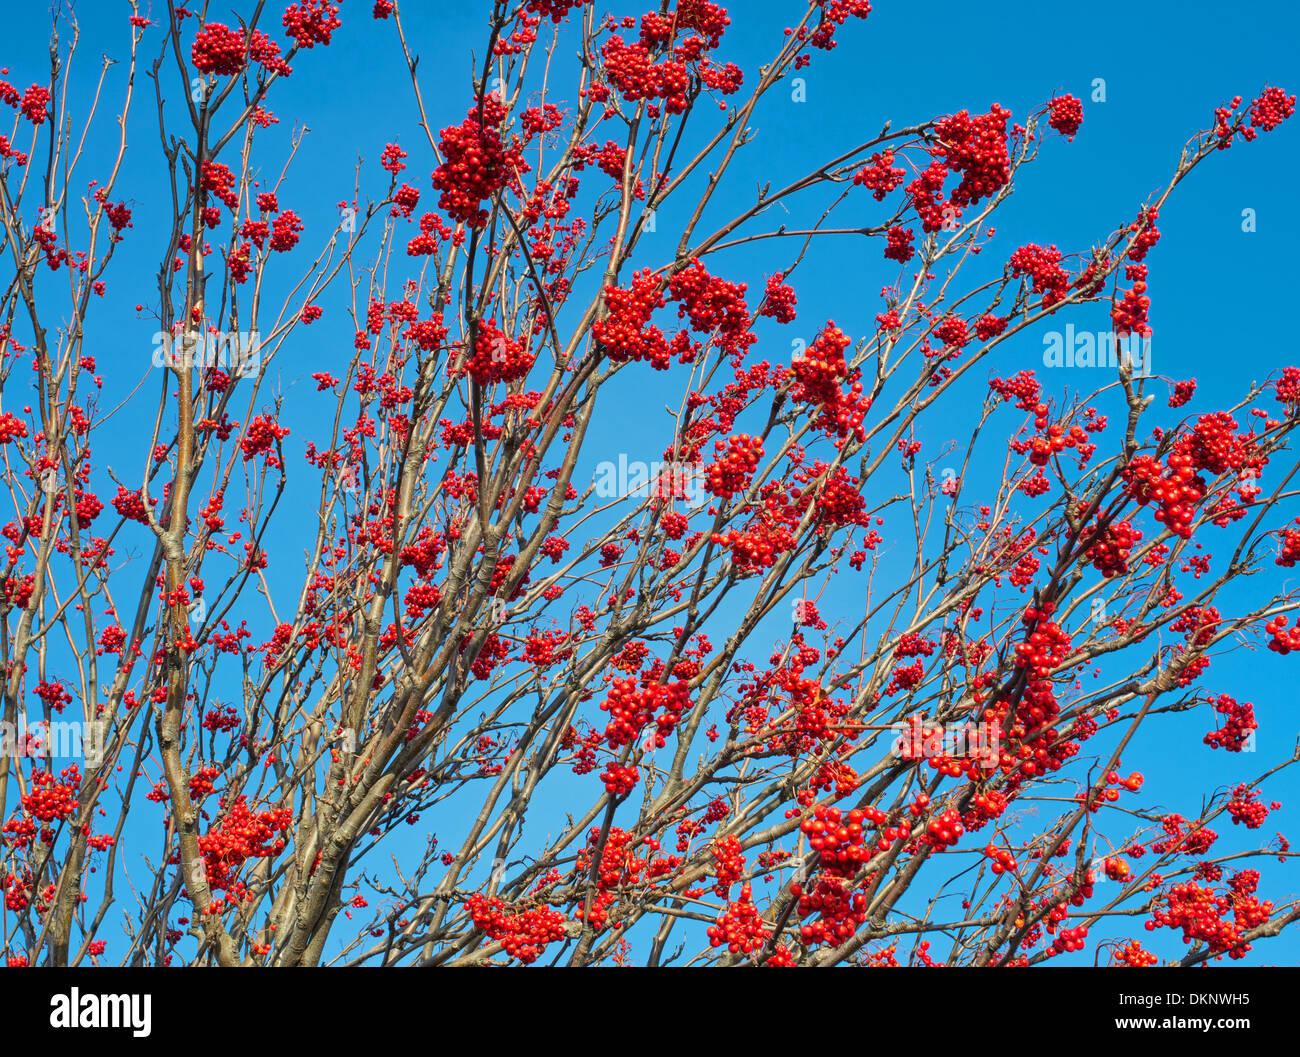 Berries on Rowan tree or Mountain Ash  ( Sorbus  Rosaceae) Sunderland, north east England UK - Stock Image